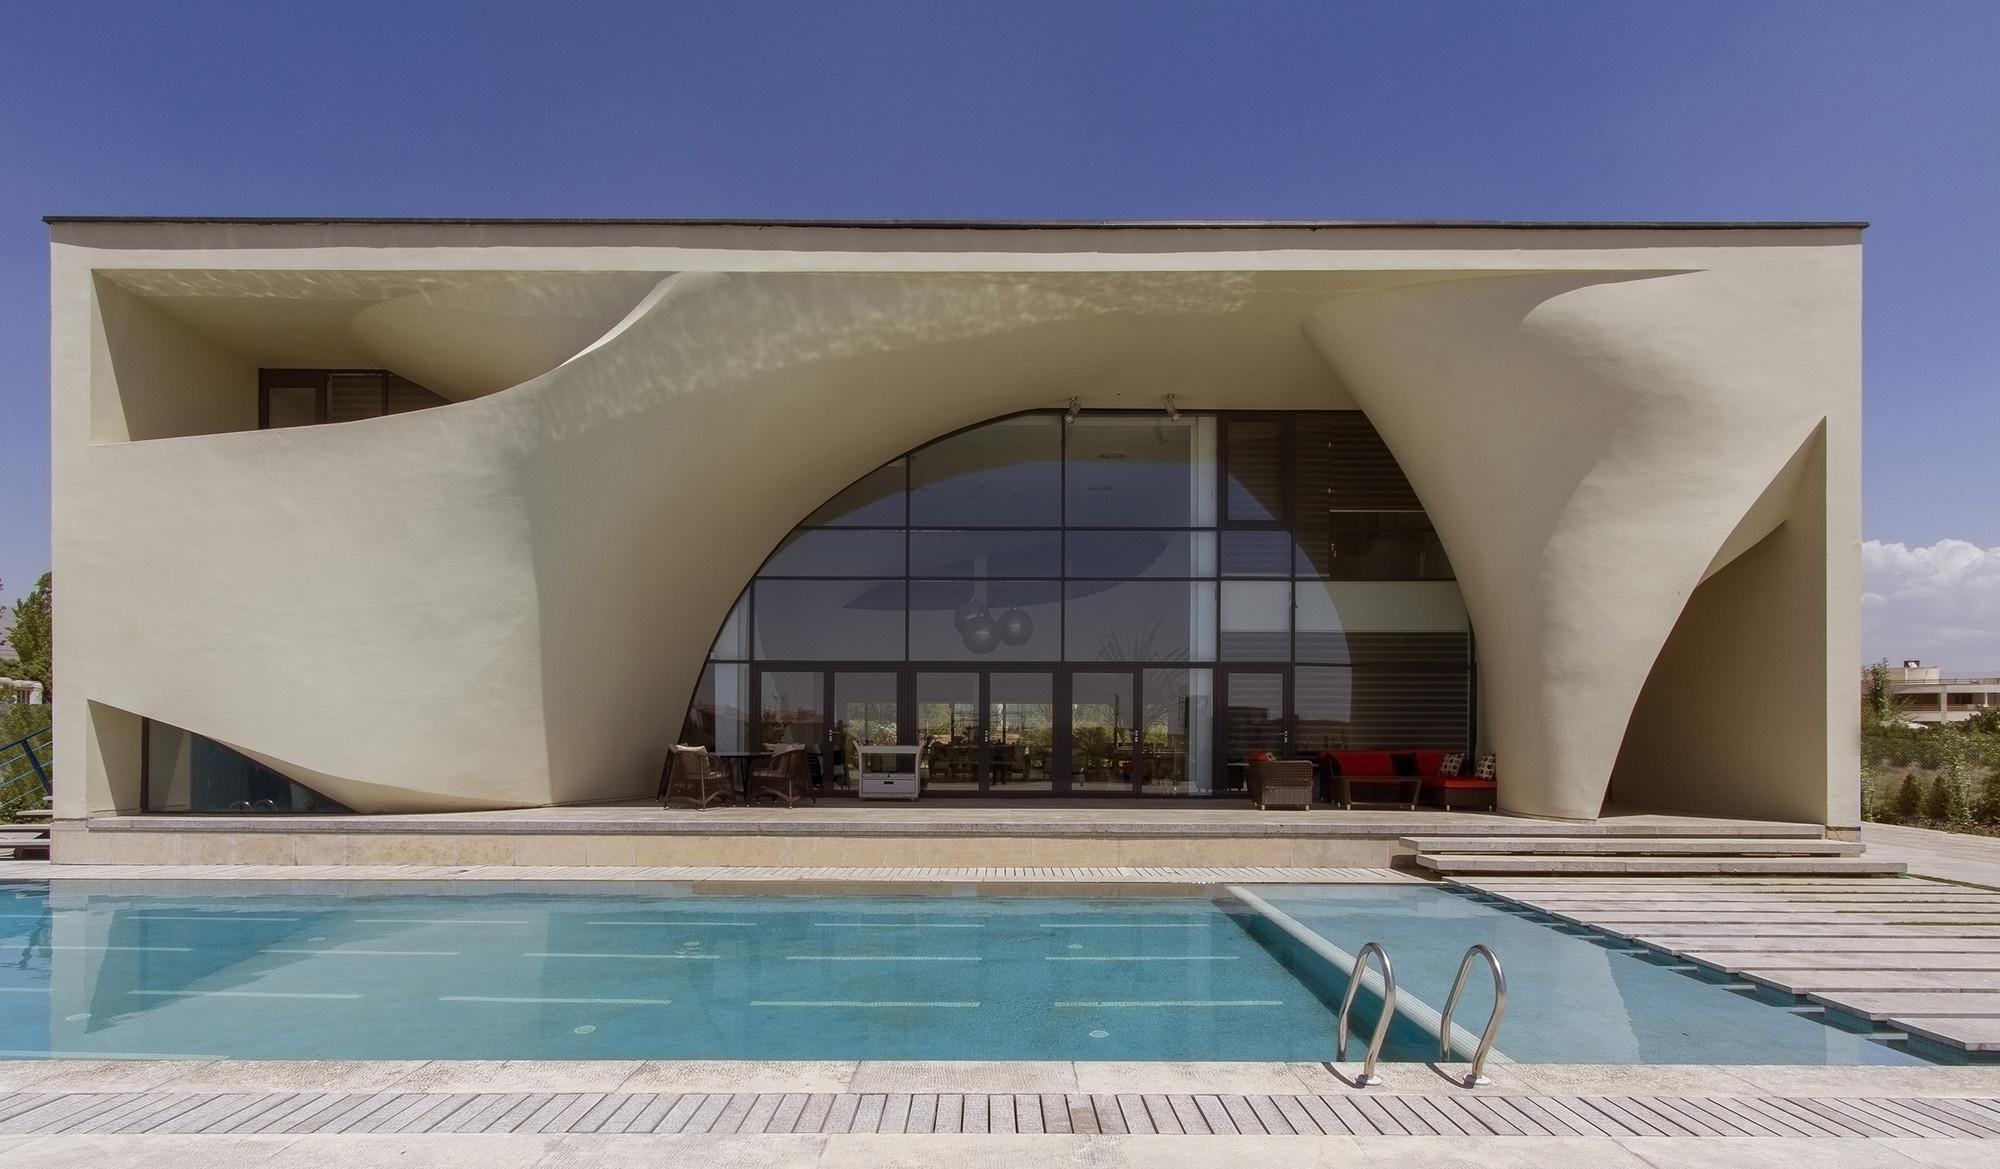 Kouhsar Villa / Next Office–Alireza Taghaboni, © Parham Taghioff